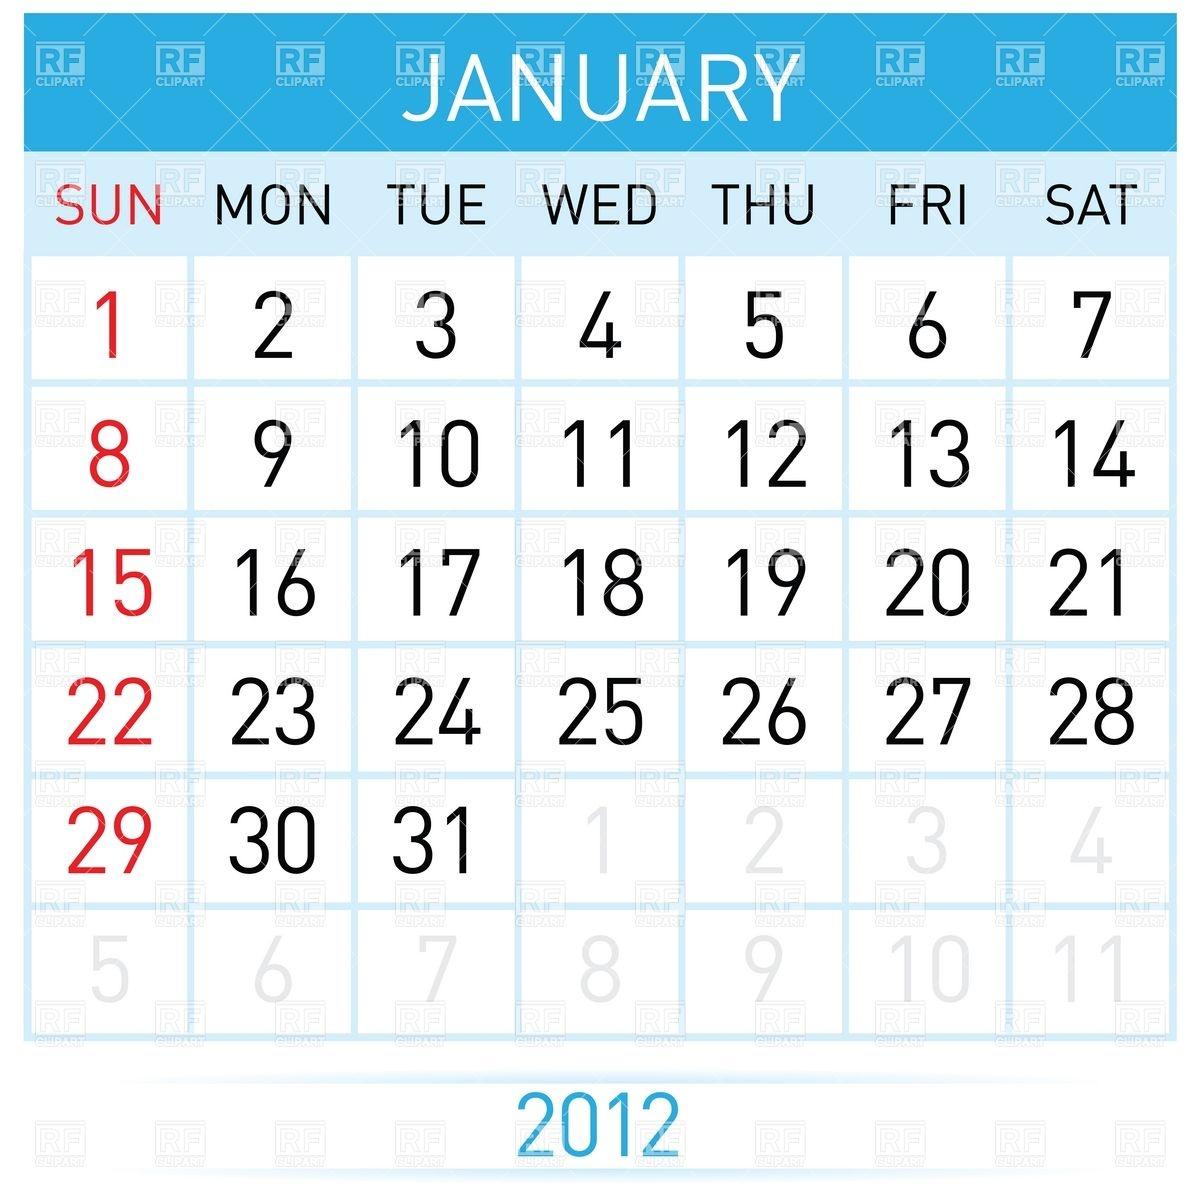 Calendar clipart january clip library January 2012 month calendar Vector Image #7729 – RFclipart clip library